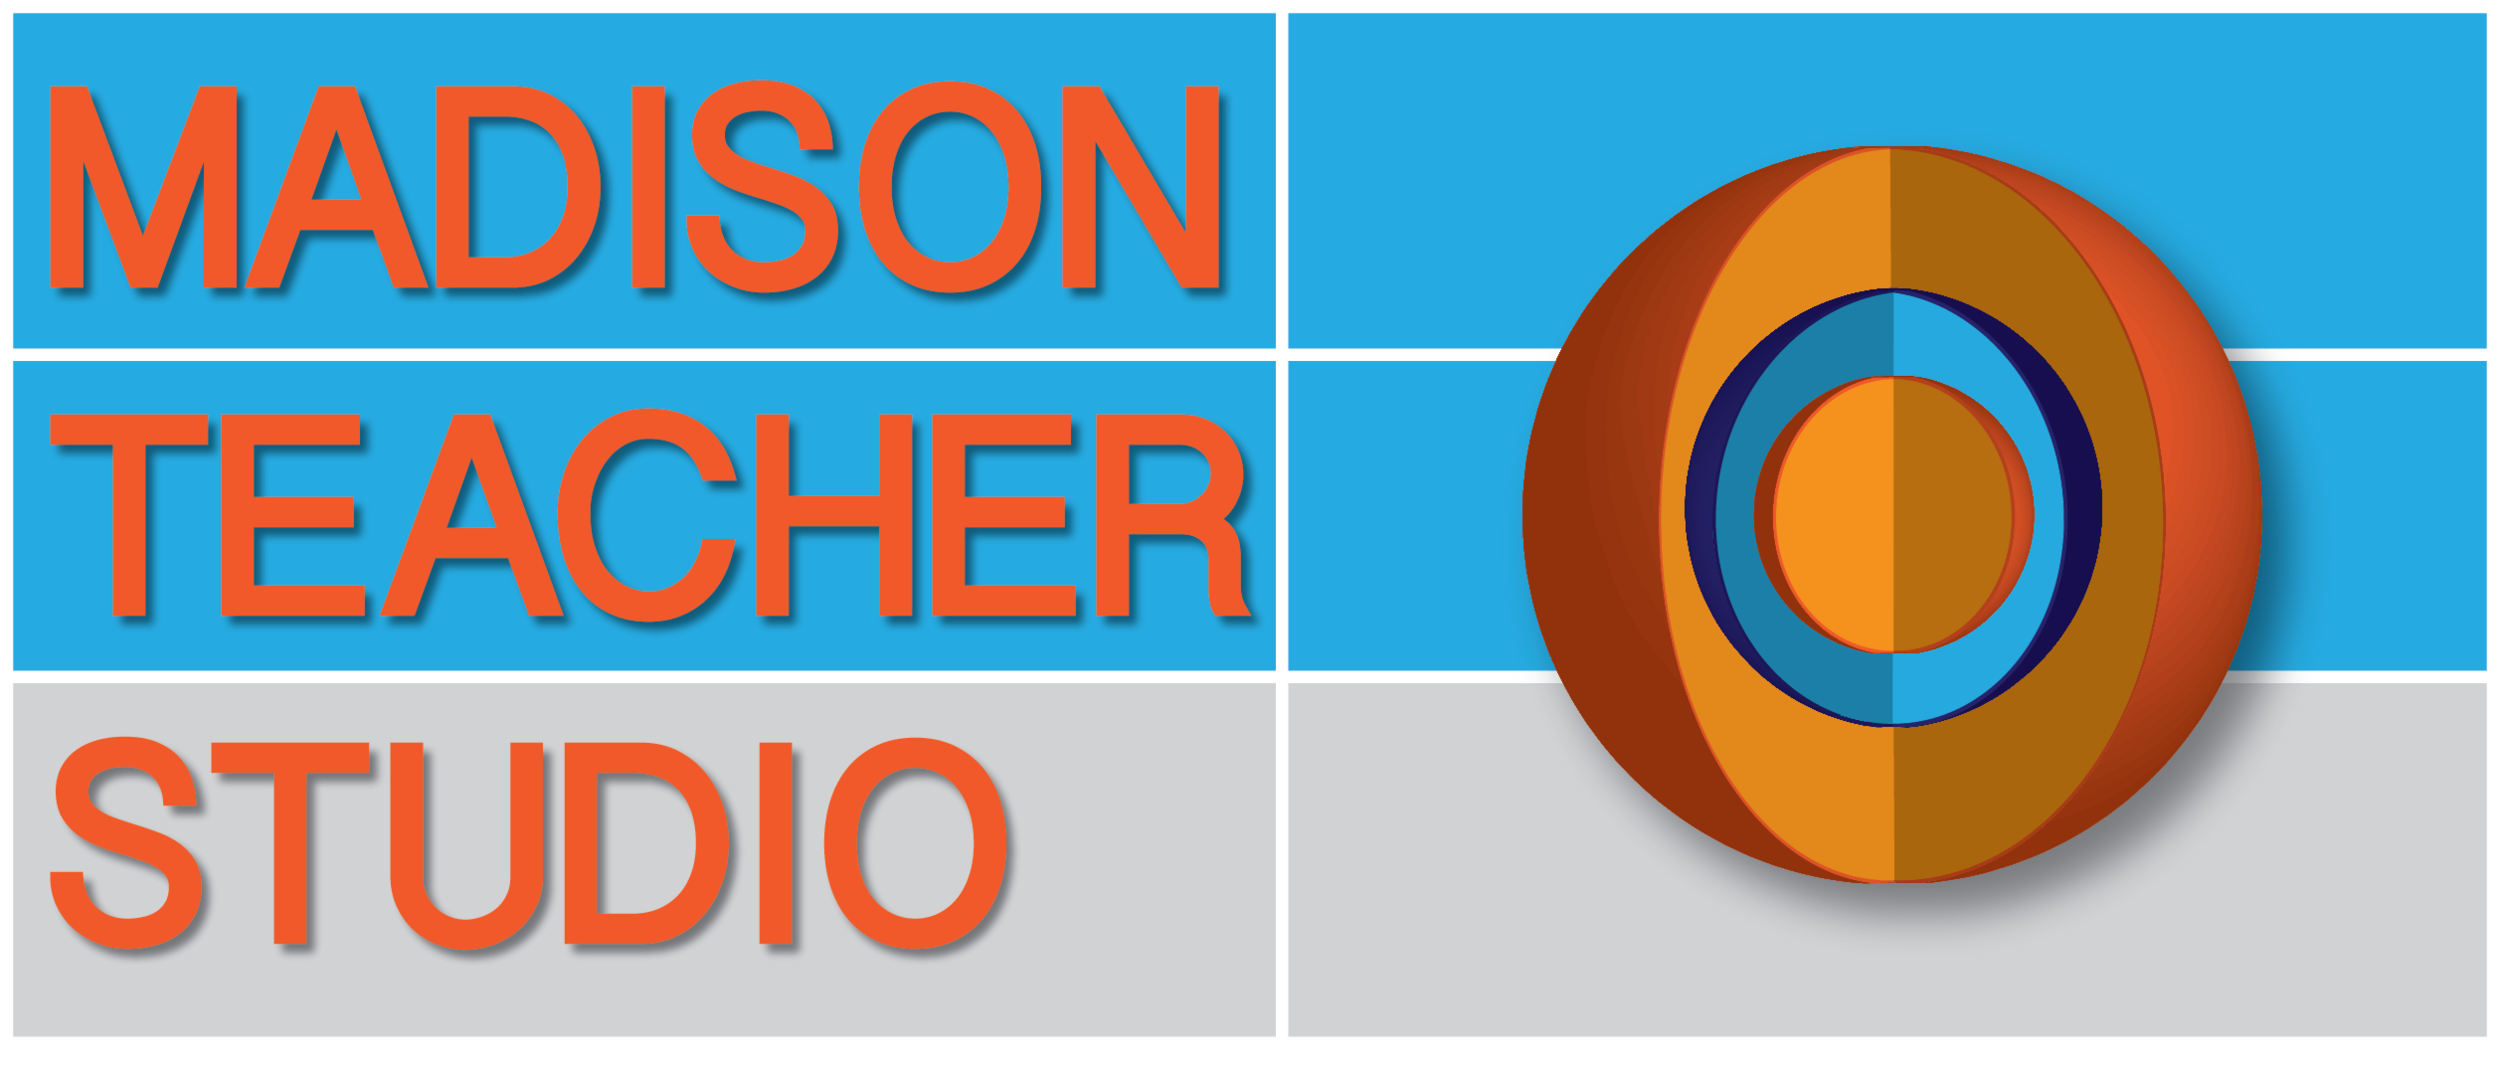 Madison Teacher Studio 1b.png